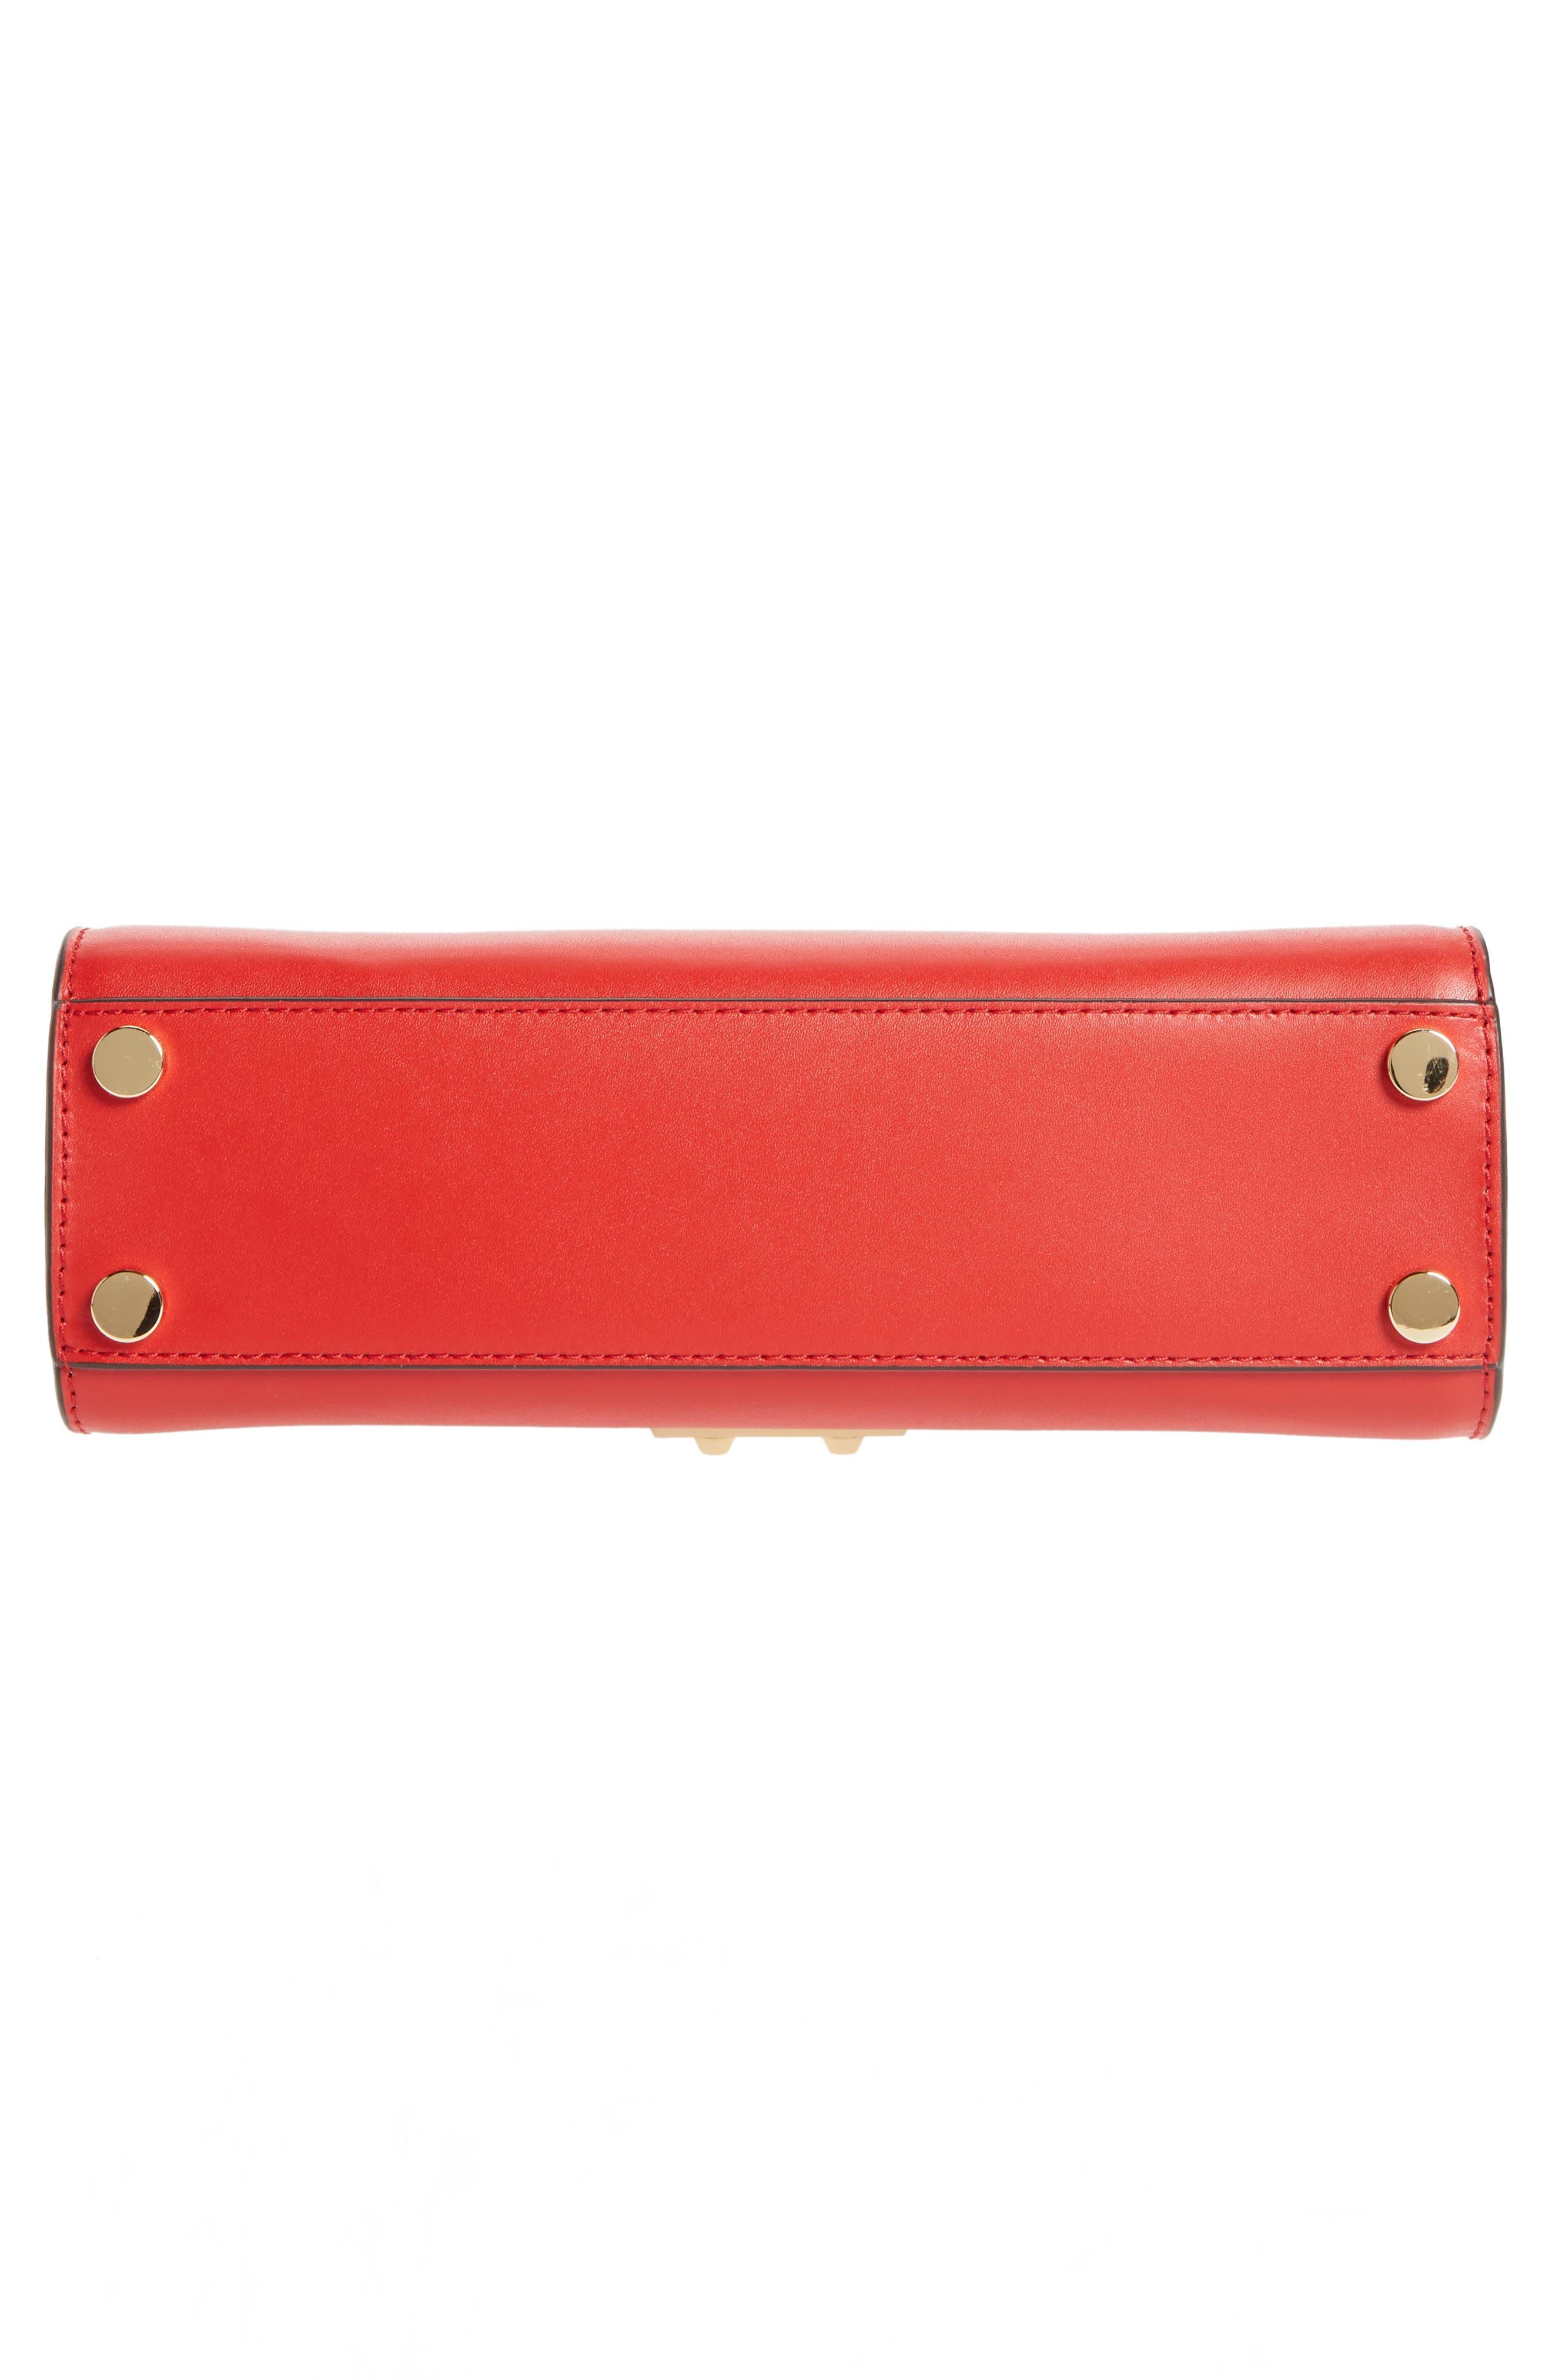 MICHAEL Michael Kors Medium Sloan Leather Satchel,                             Alternate thumbnail 6, color,                             Bright Red